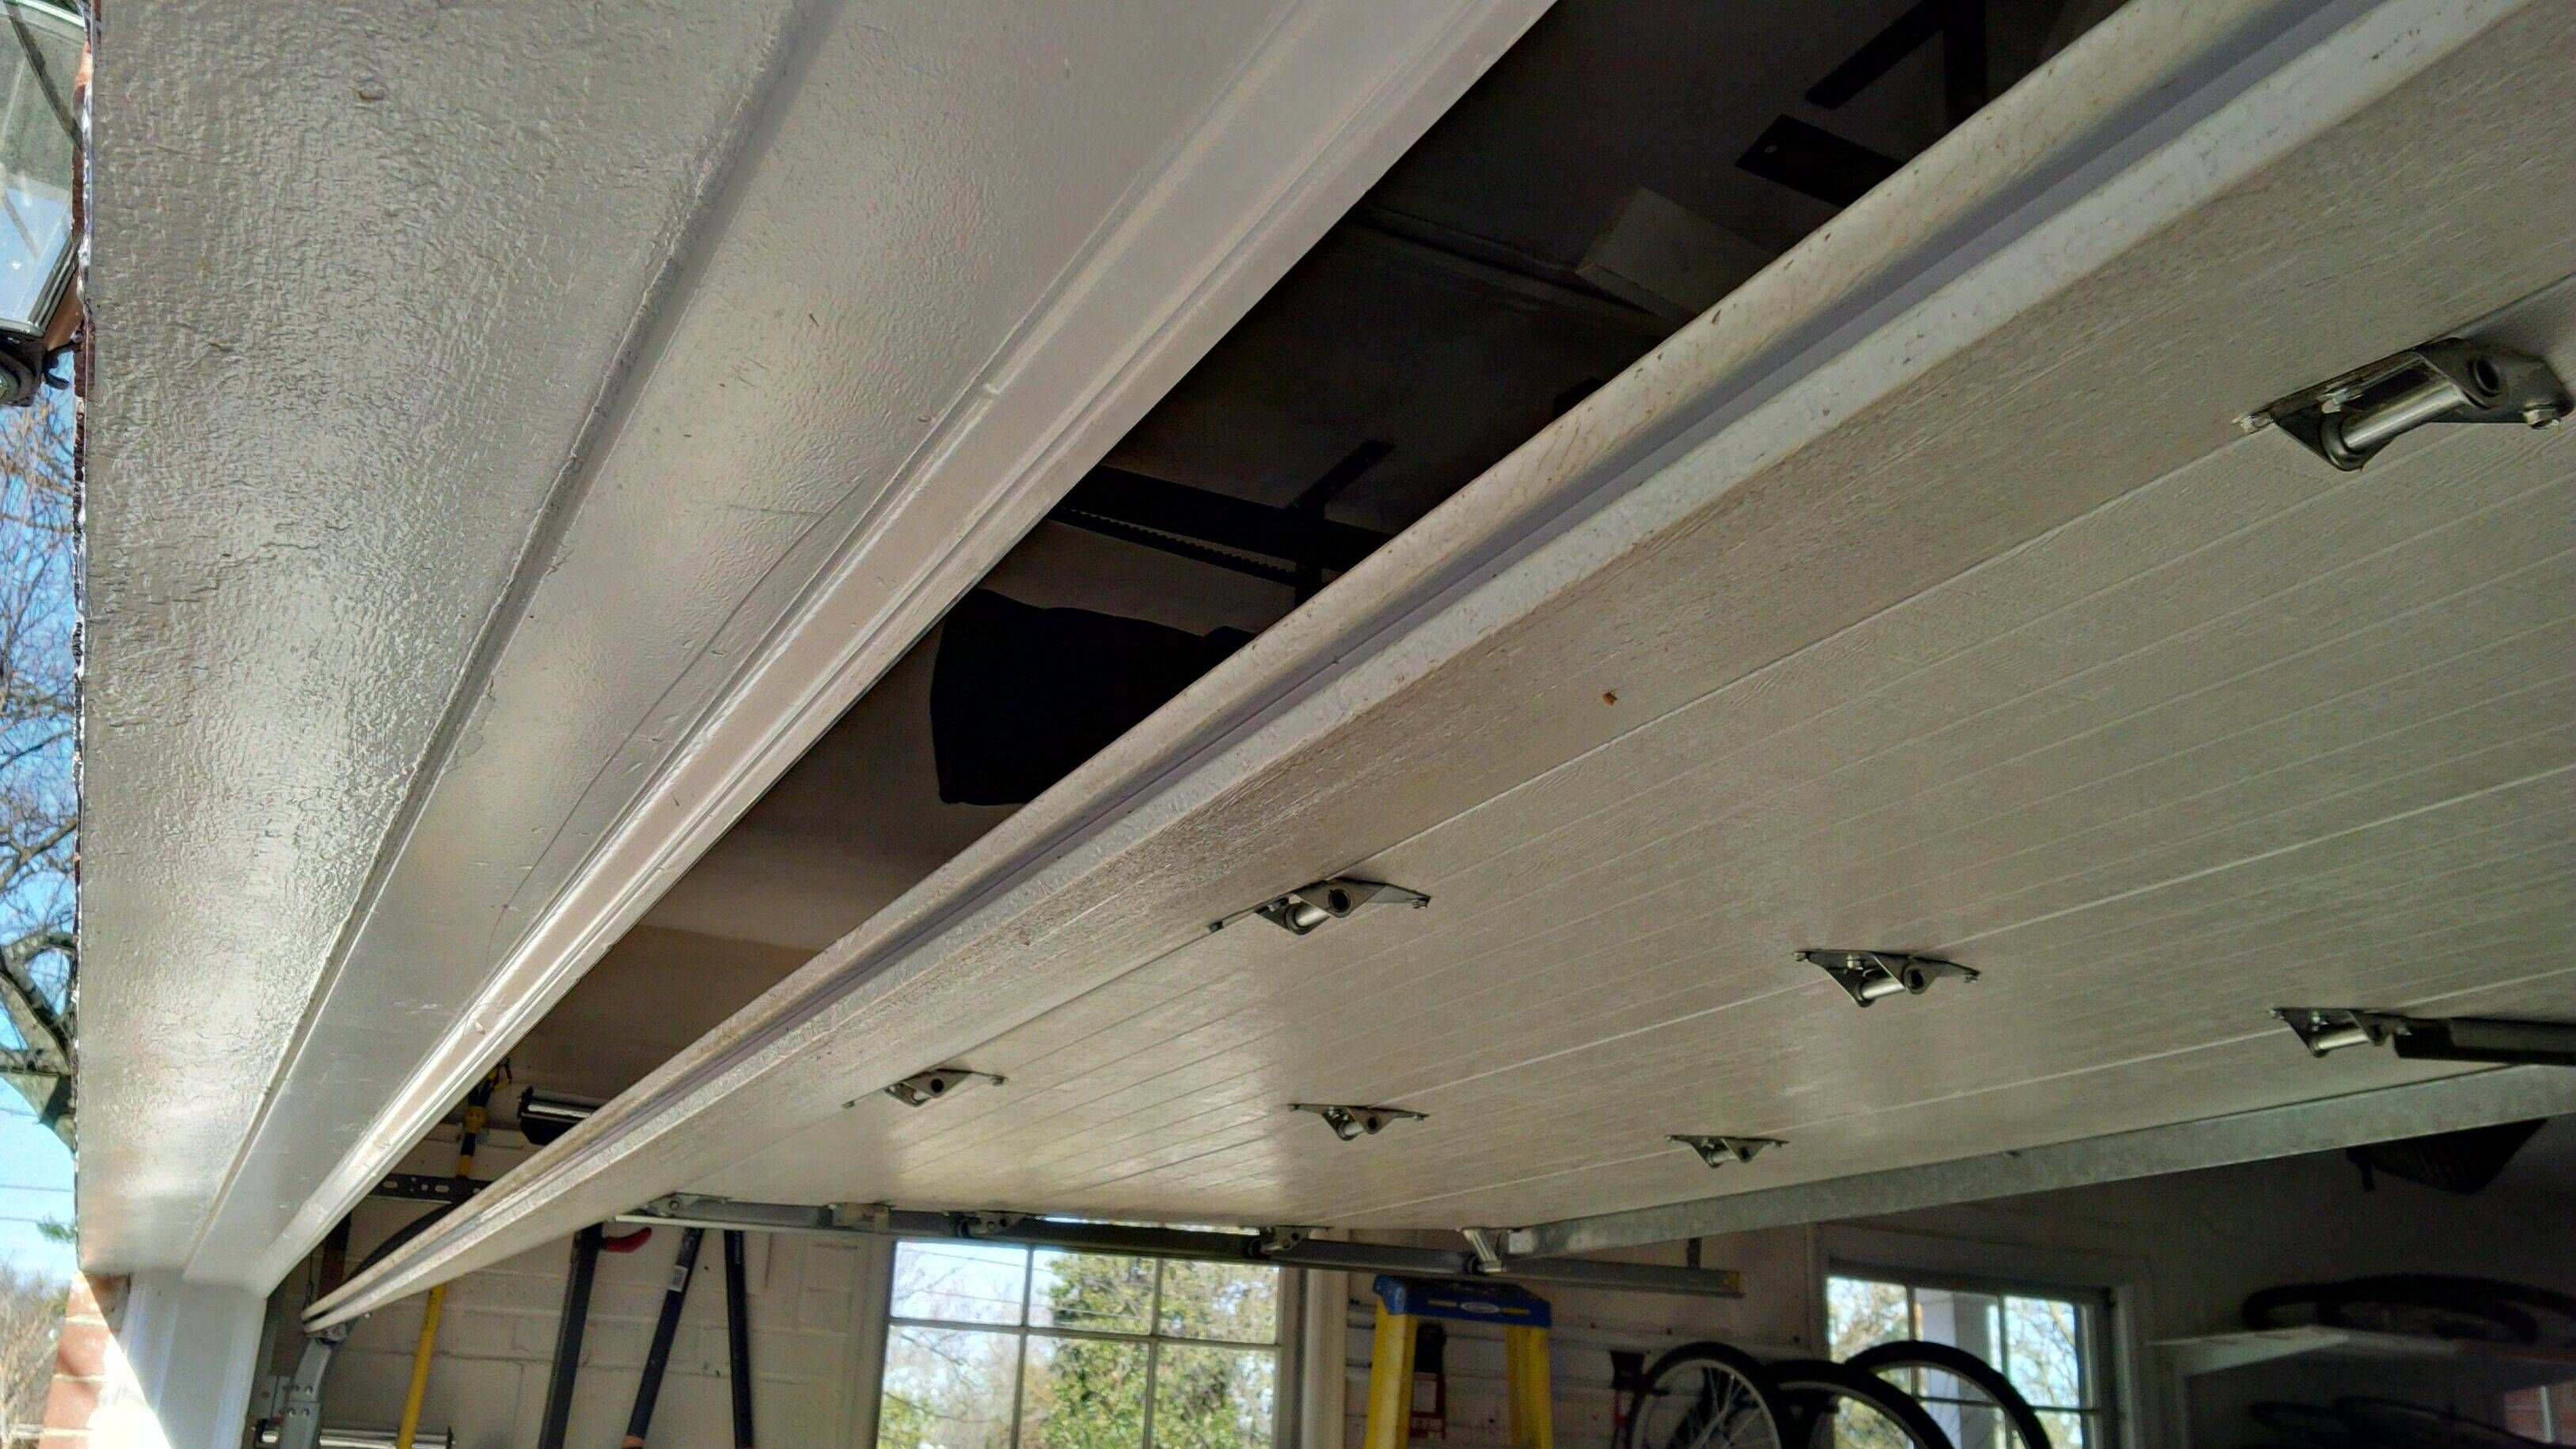 using last nc garage doors repair inspire efficiency wilkesboro excellent raleigh for benefits austin precision safety and of door great